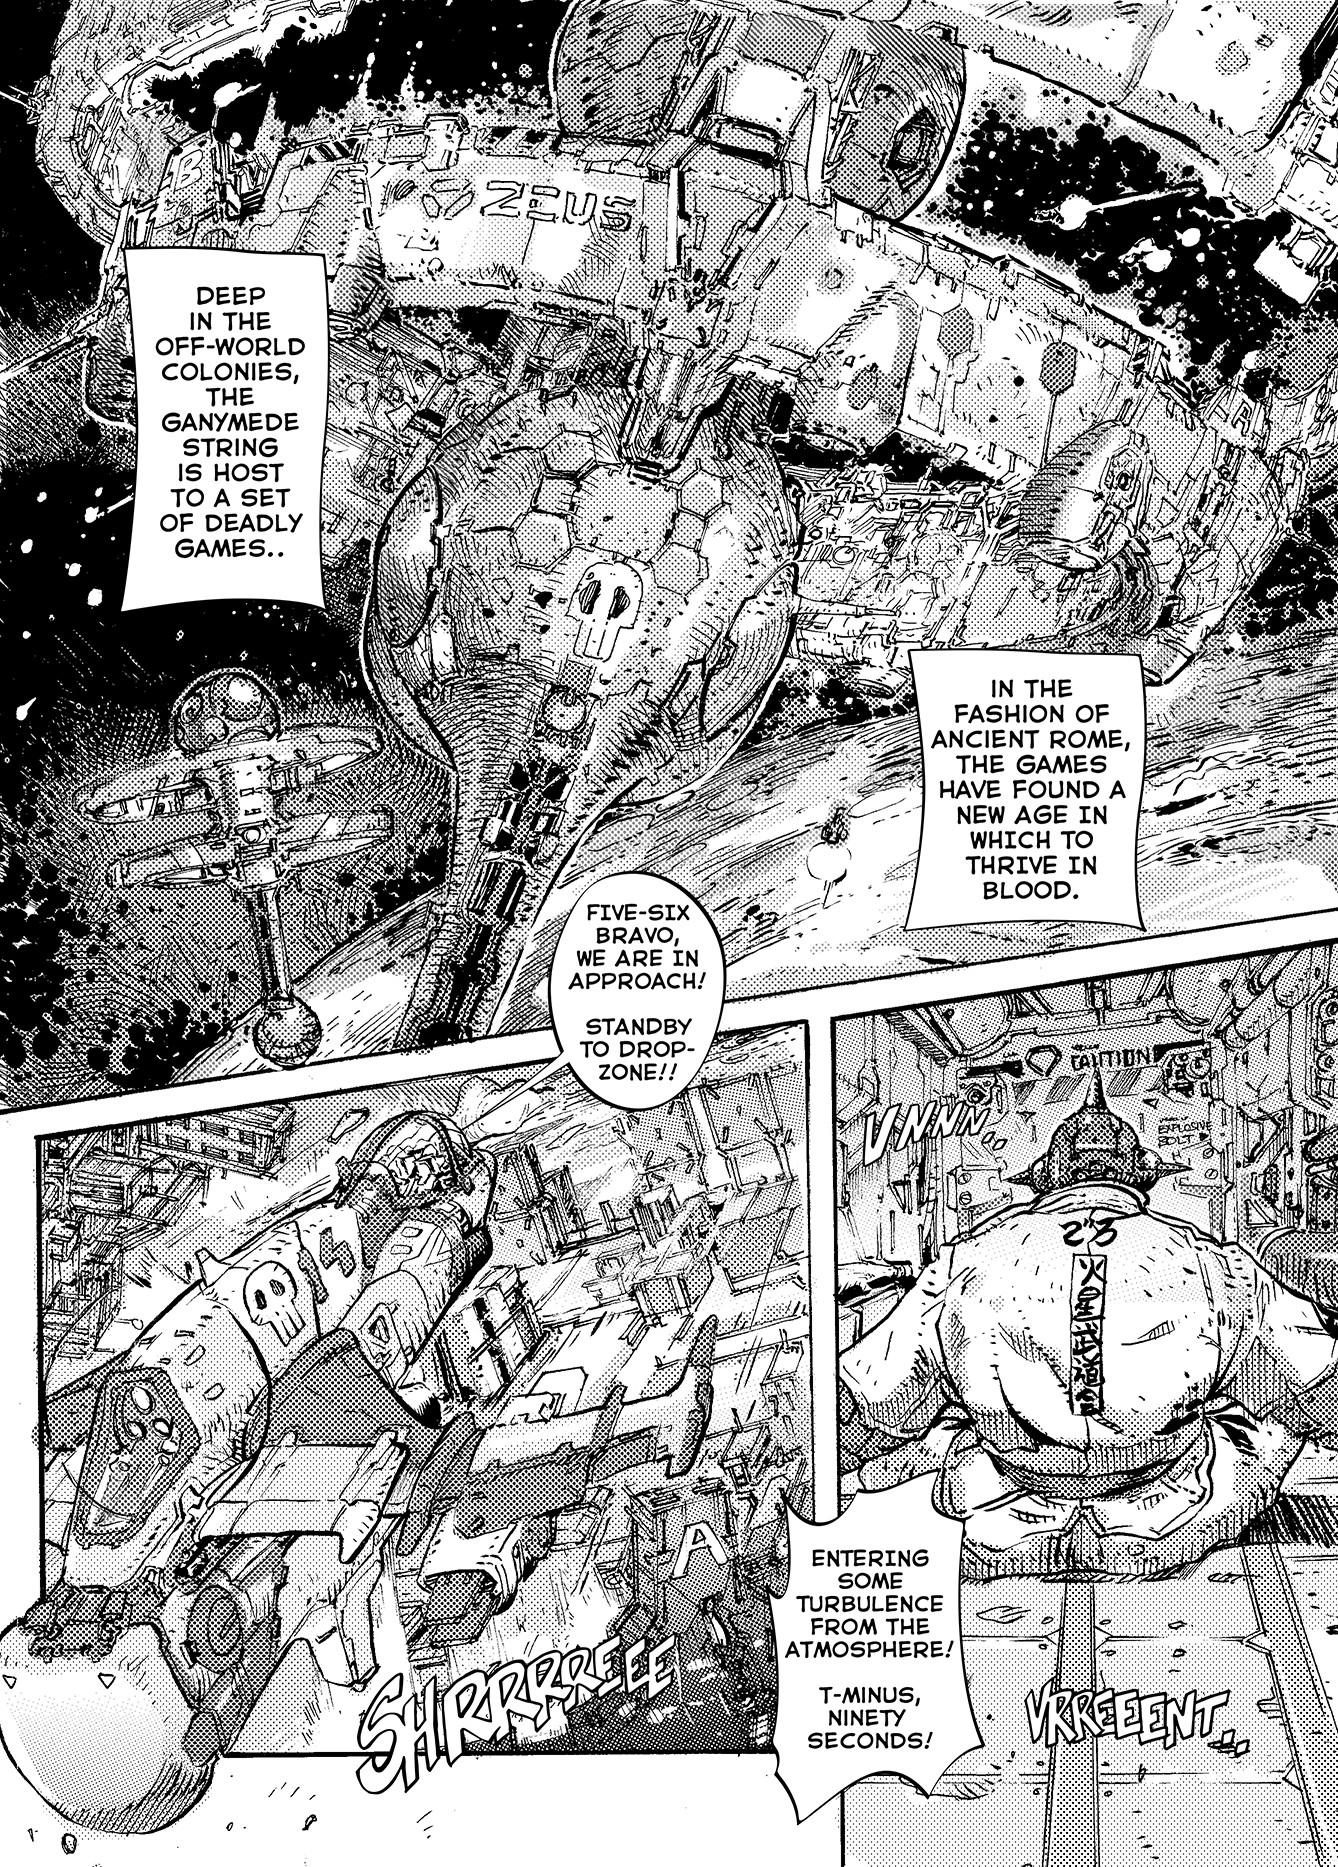 Tony leonard tl comics cutscene gorochan pg01 edit prevw